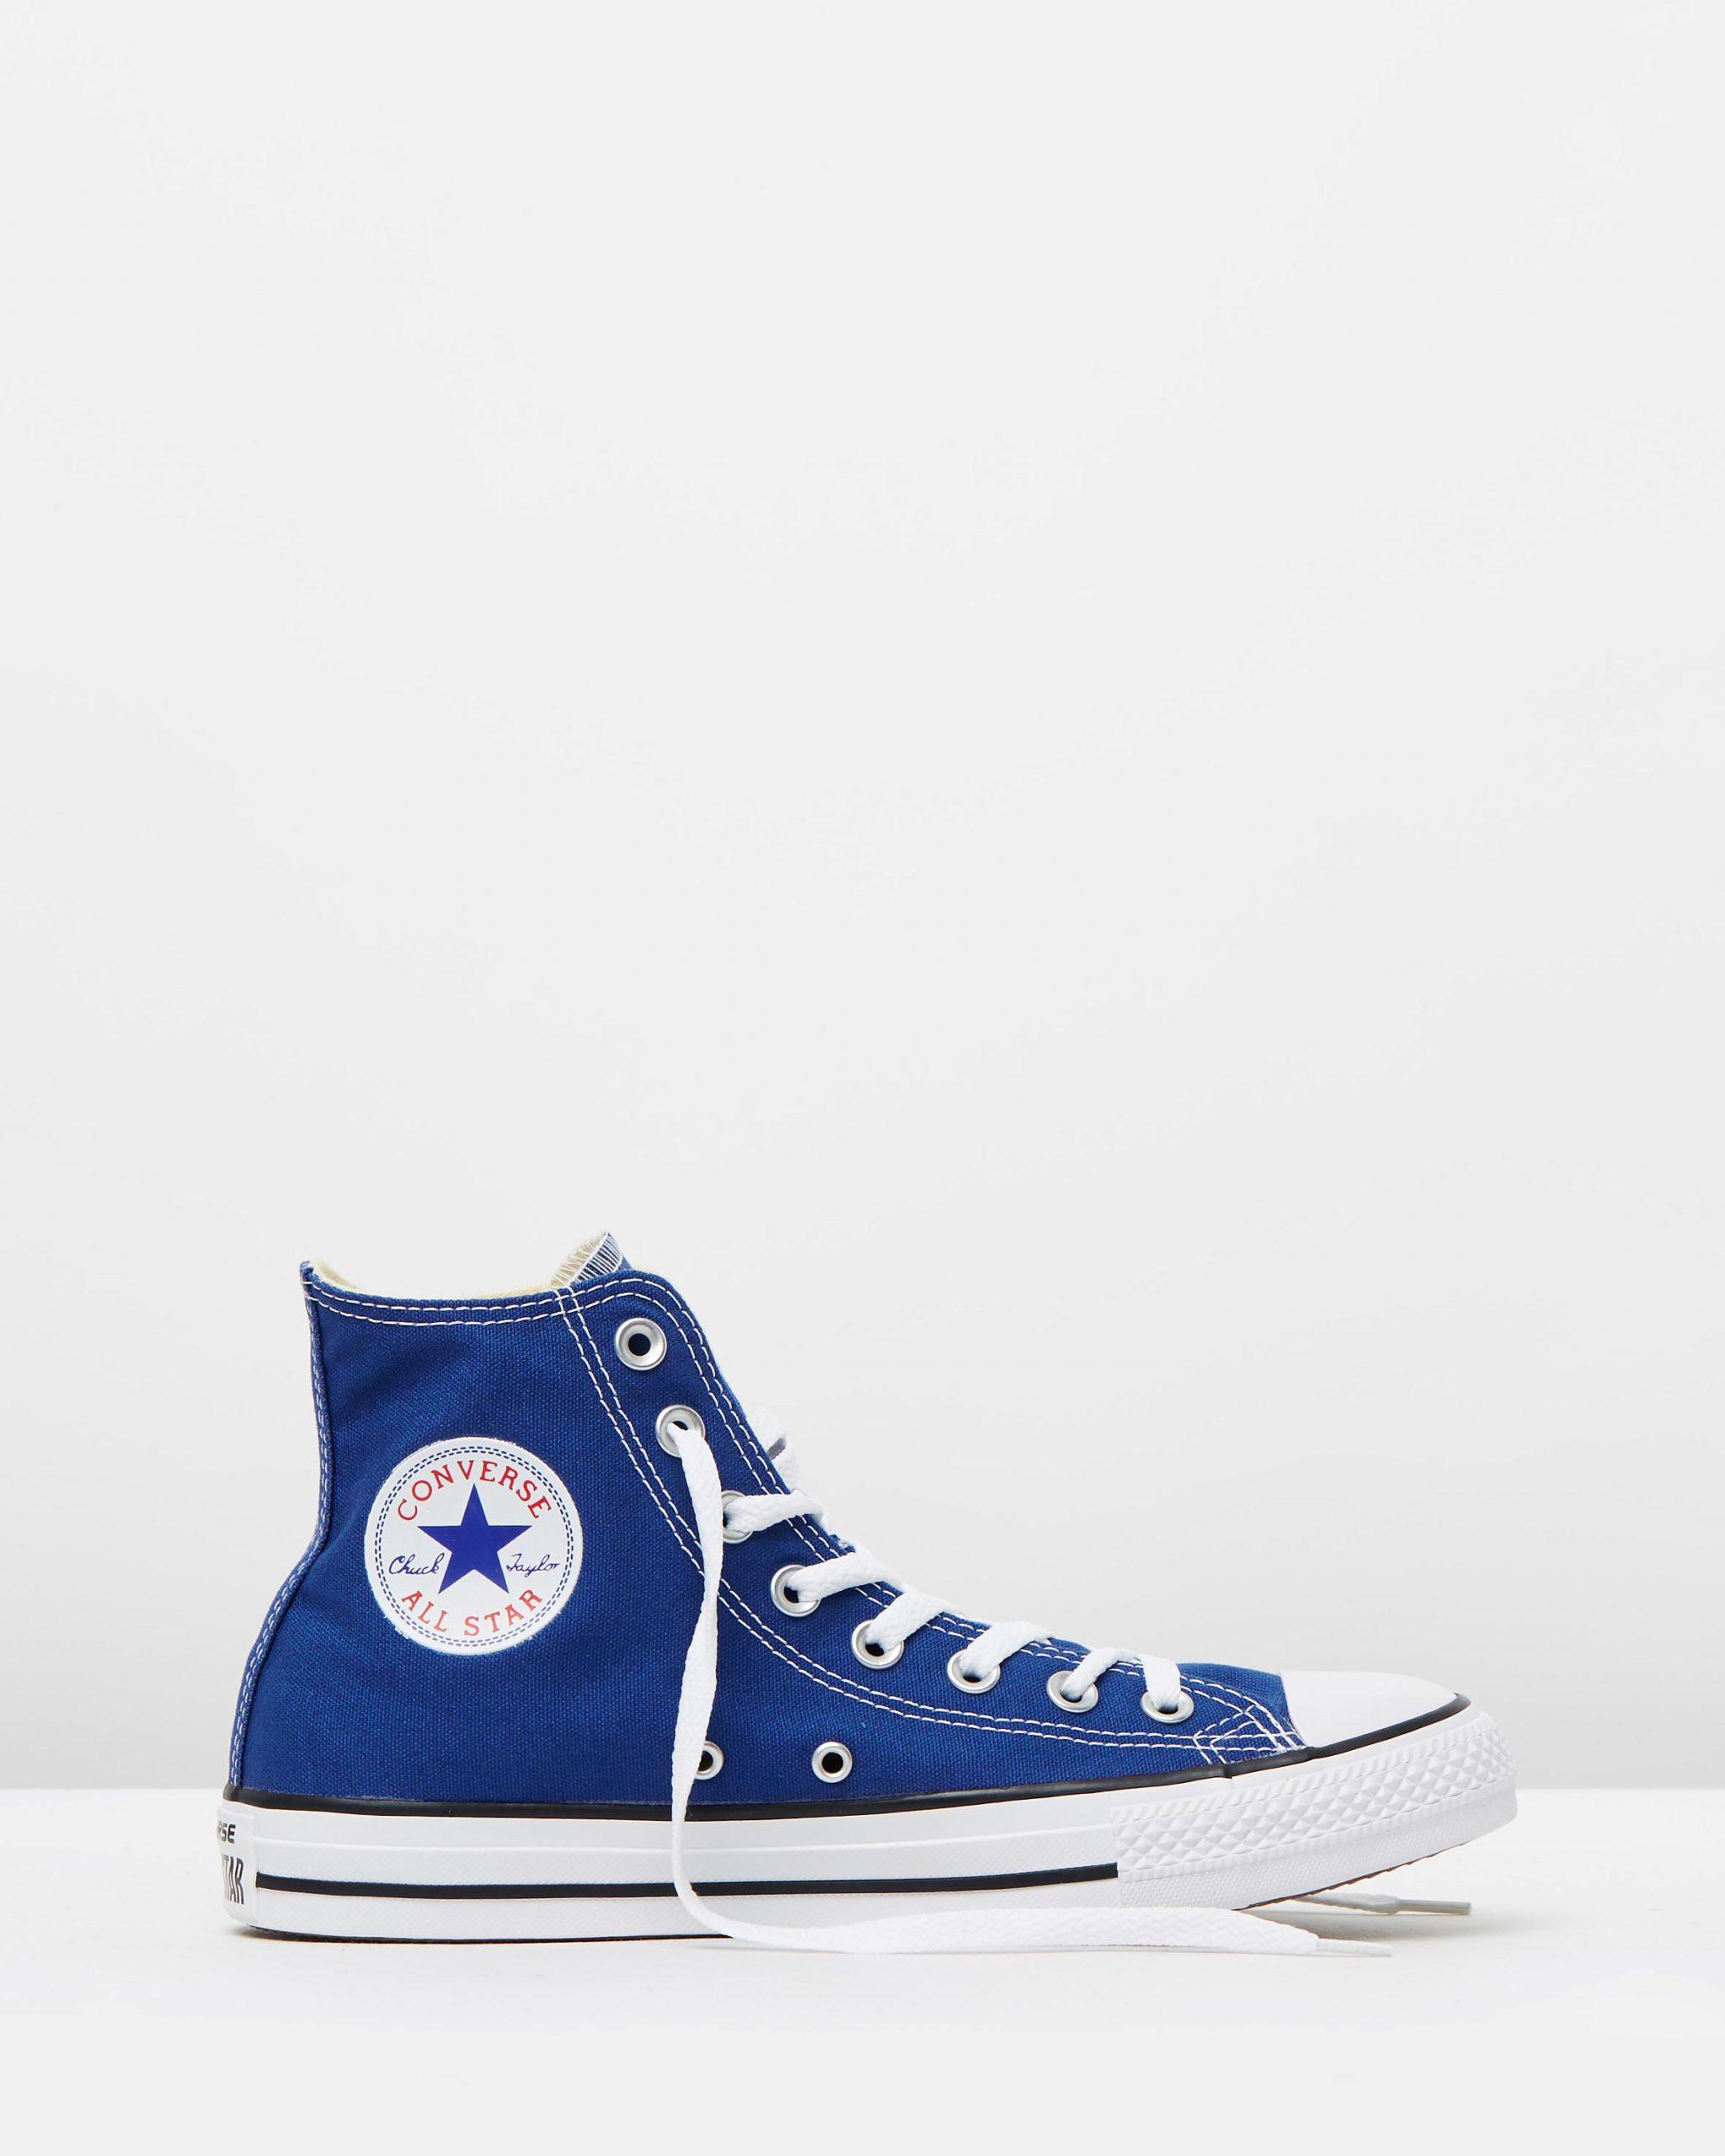 Converse Chuck Taylor All Star Hi Womens Roadtrip Blue